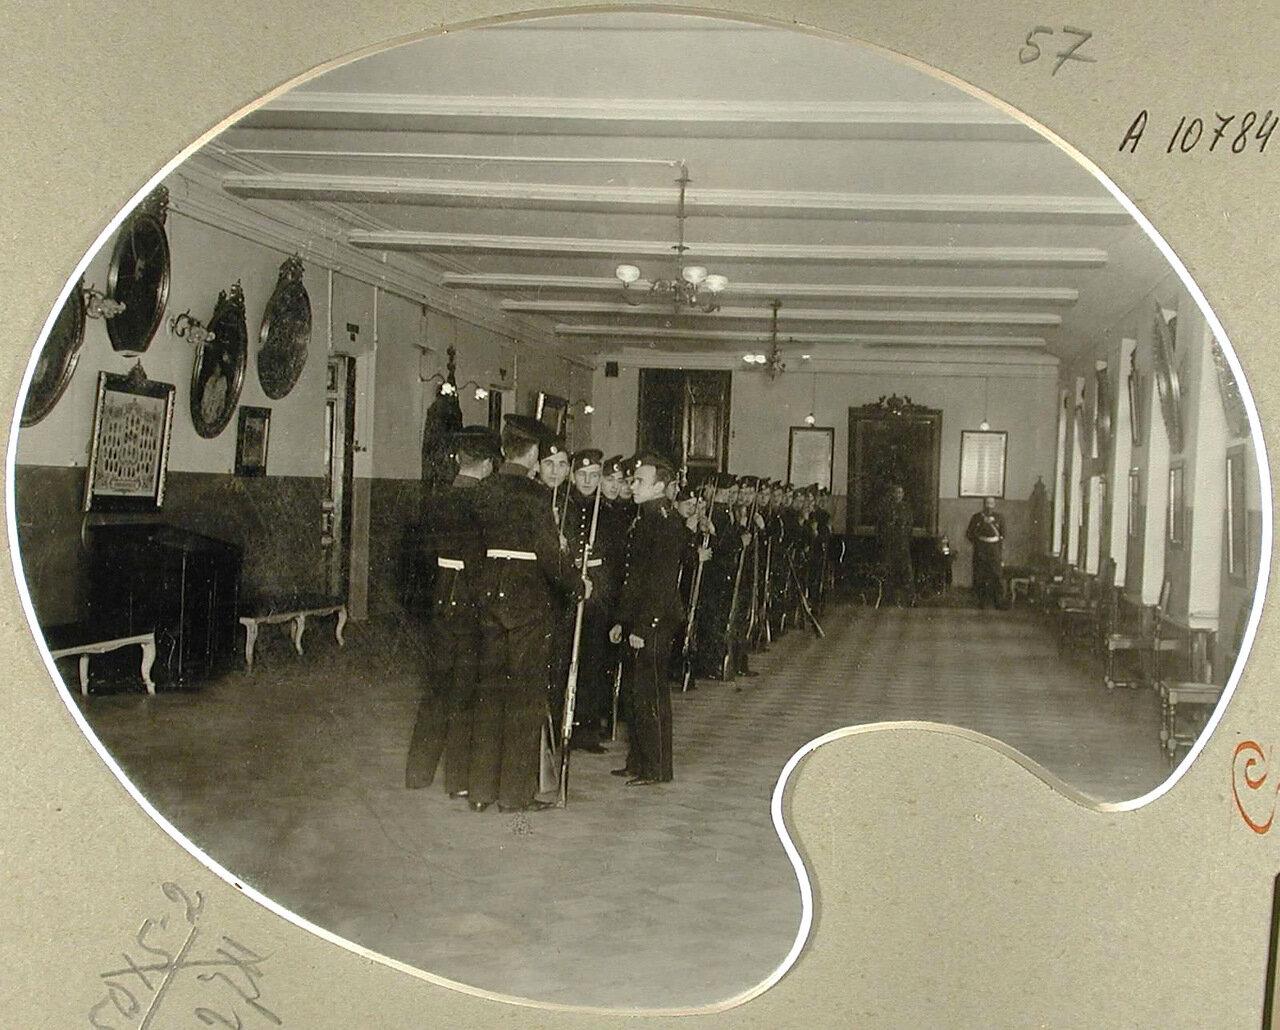 57. Воспитанники в зале перед началом строевых занятий